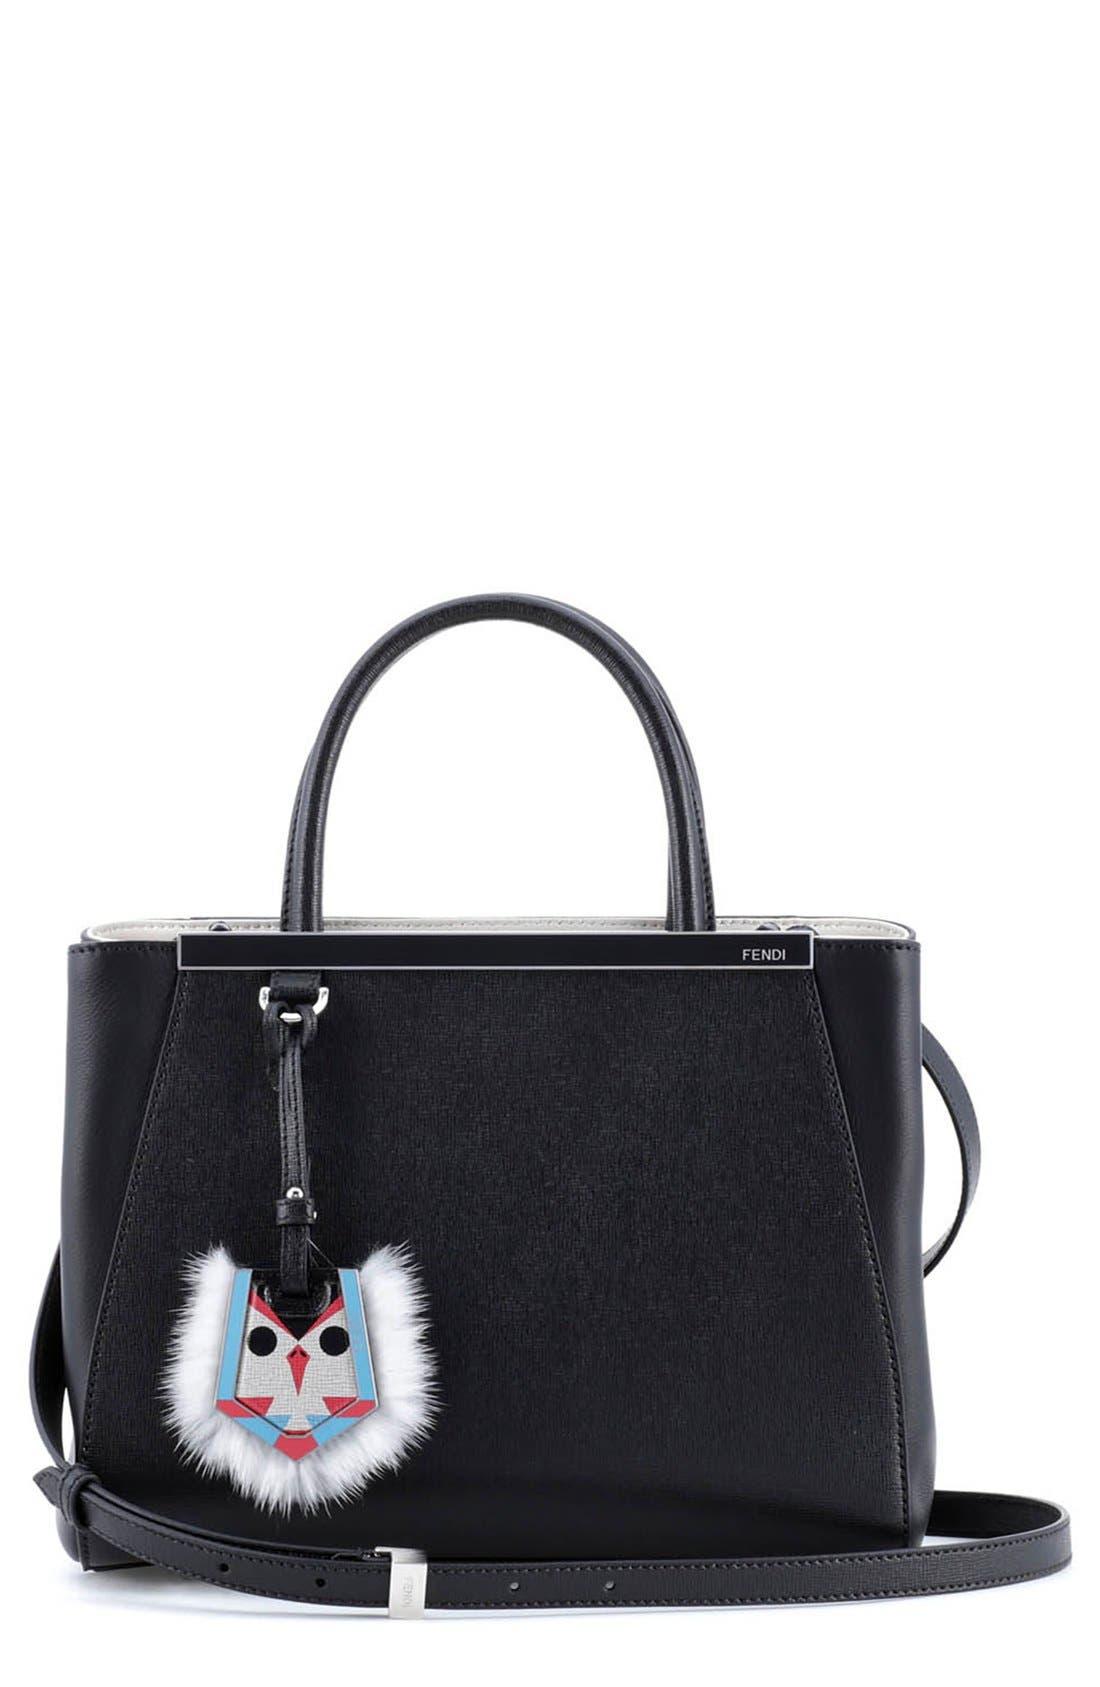 Main Image - Fendi 'Petite 2Jours' Leather Shopper with Genuine Mink Fur & Genuine Fox Fur Bird Charm